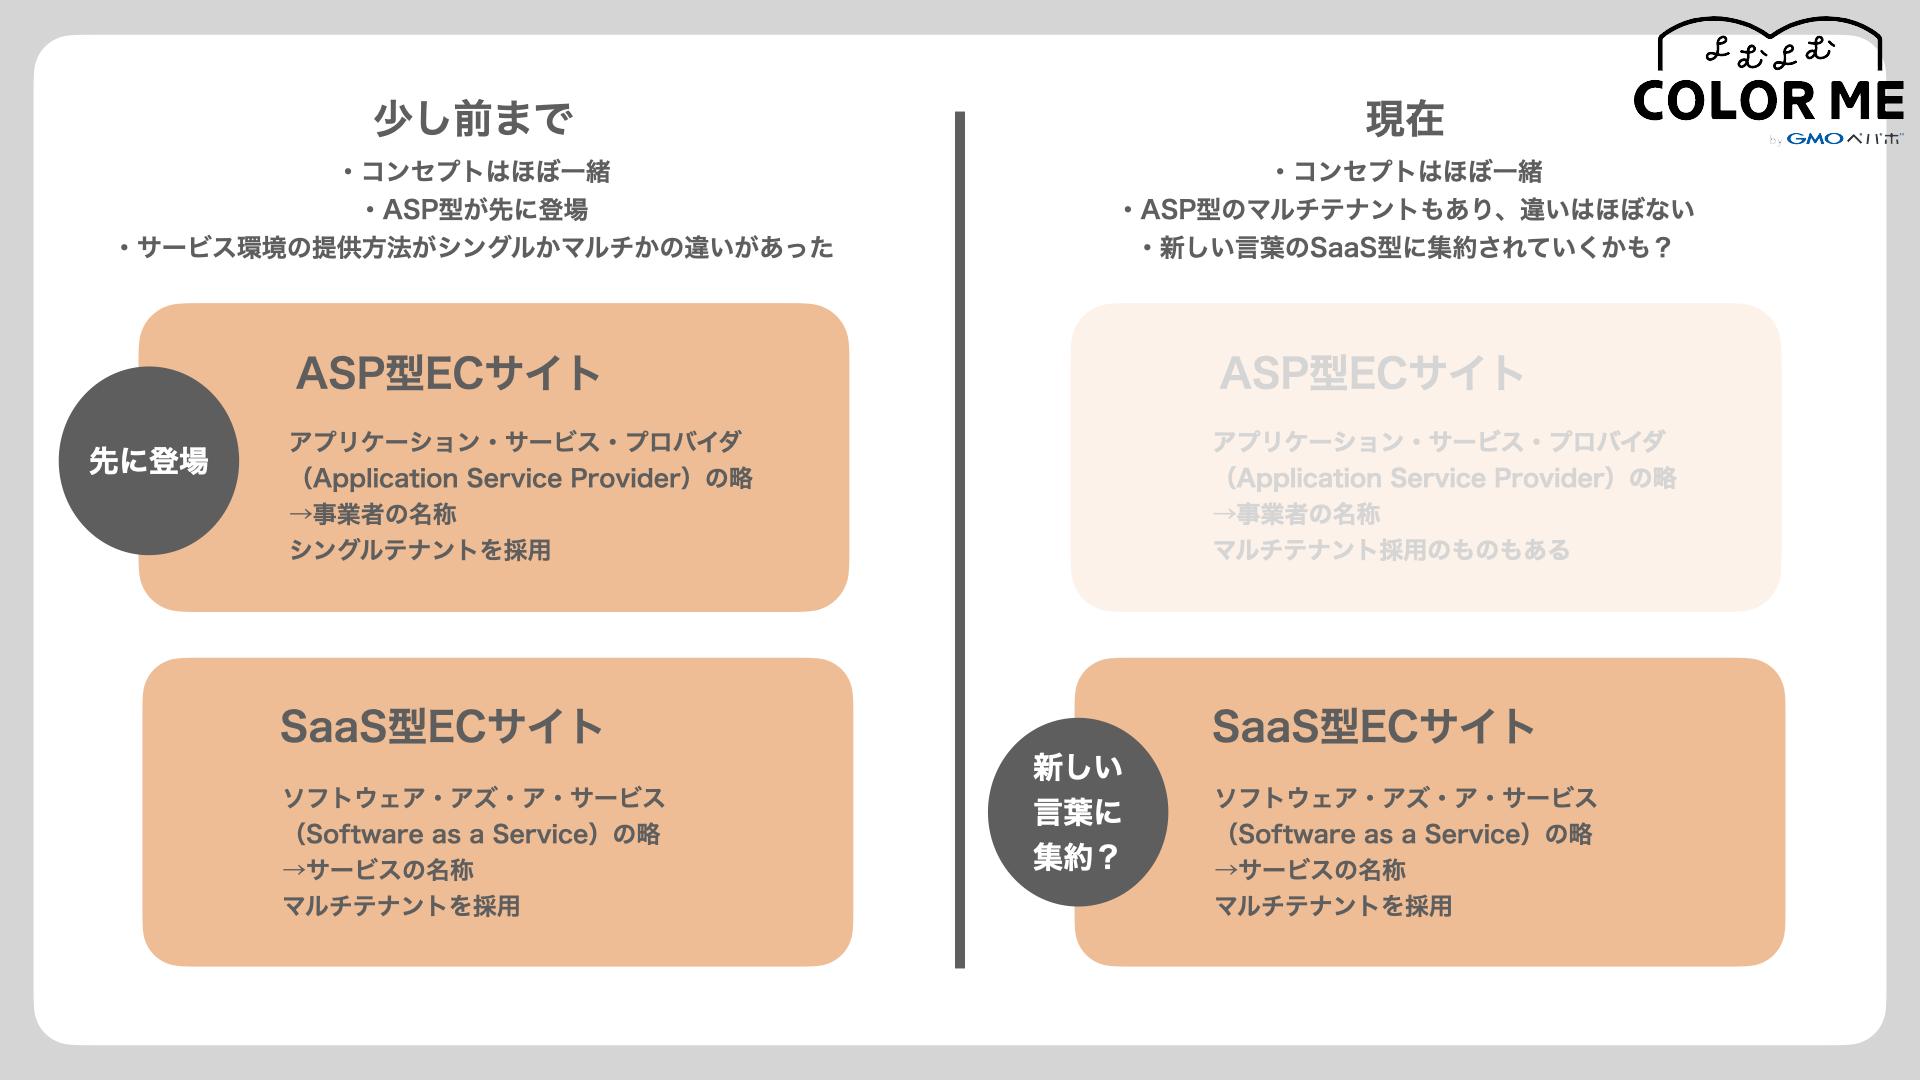 「ASP型」「SaaS型」についての違いの図解